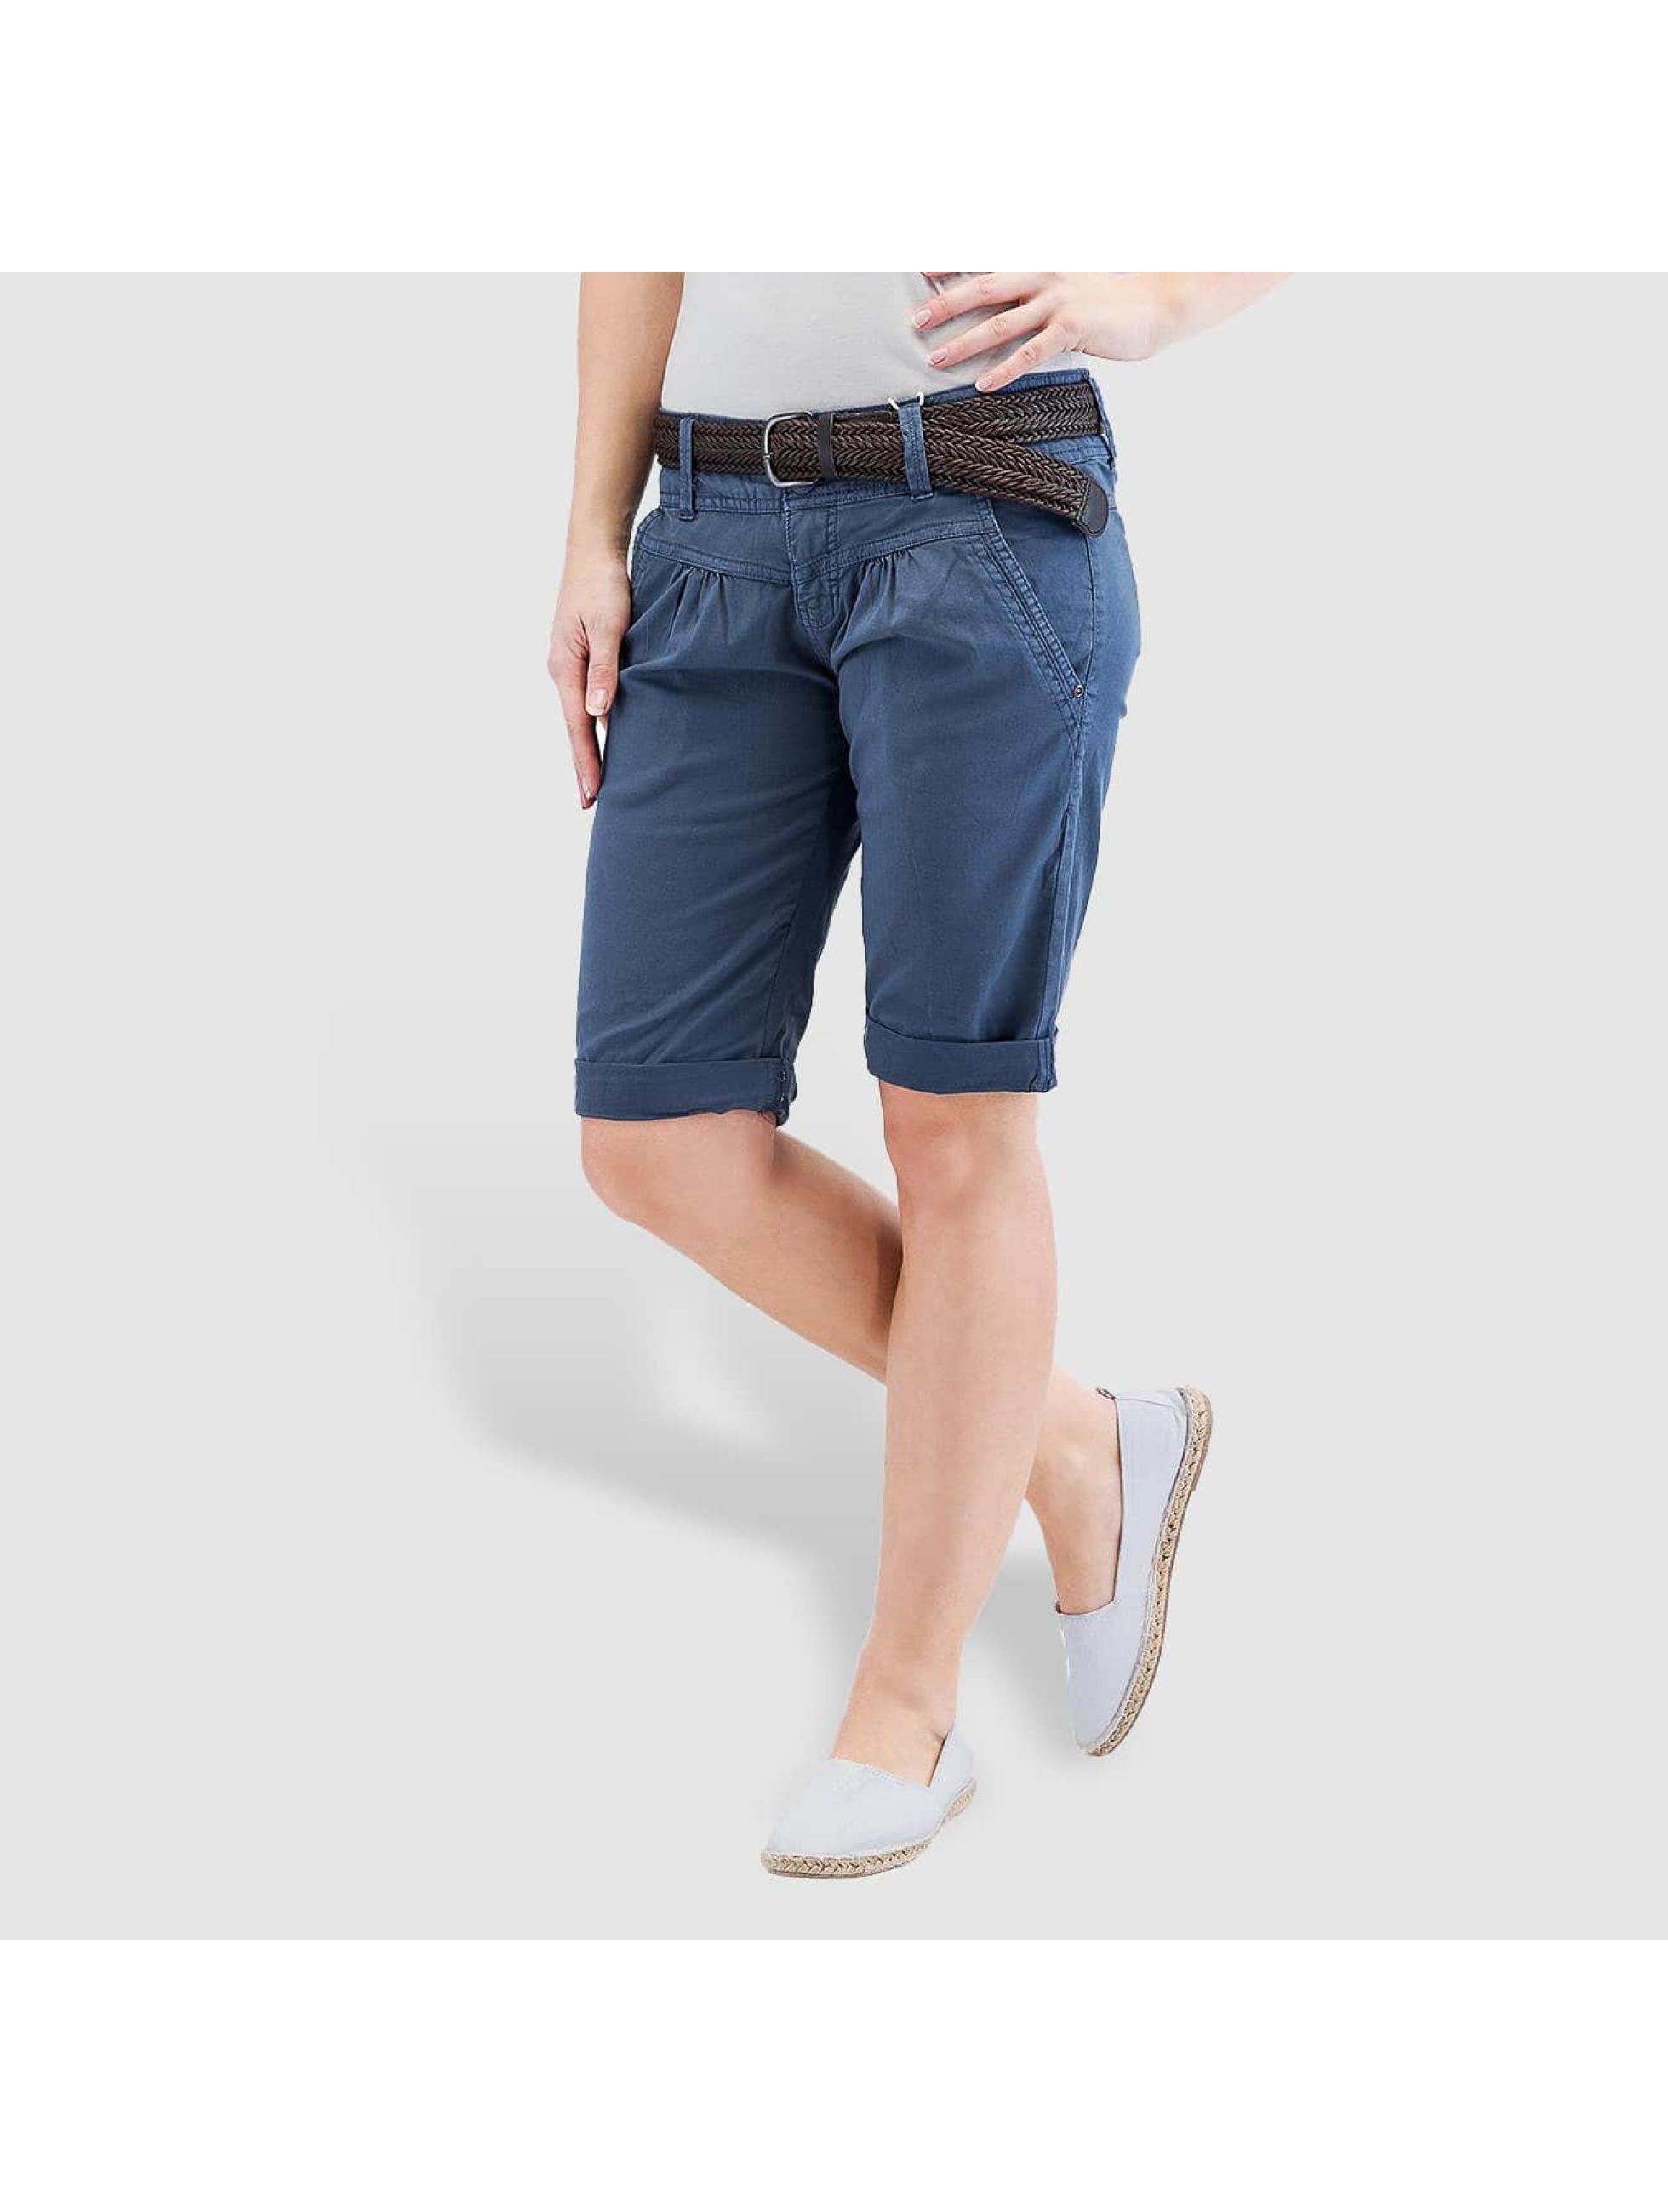 Fresh Made Frauen Shorts Jaden in blau